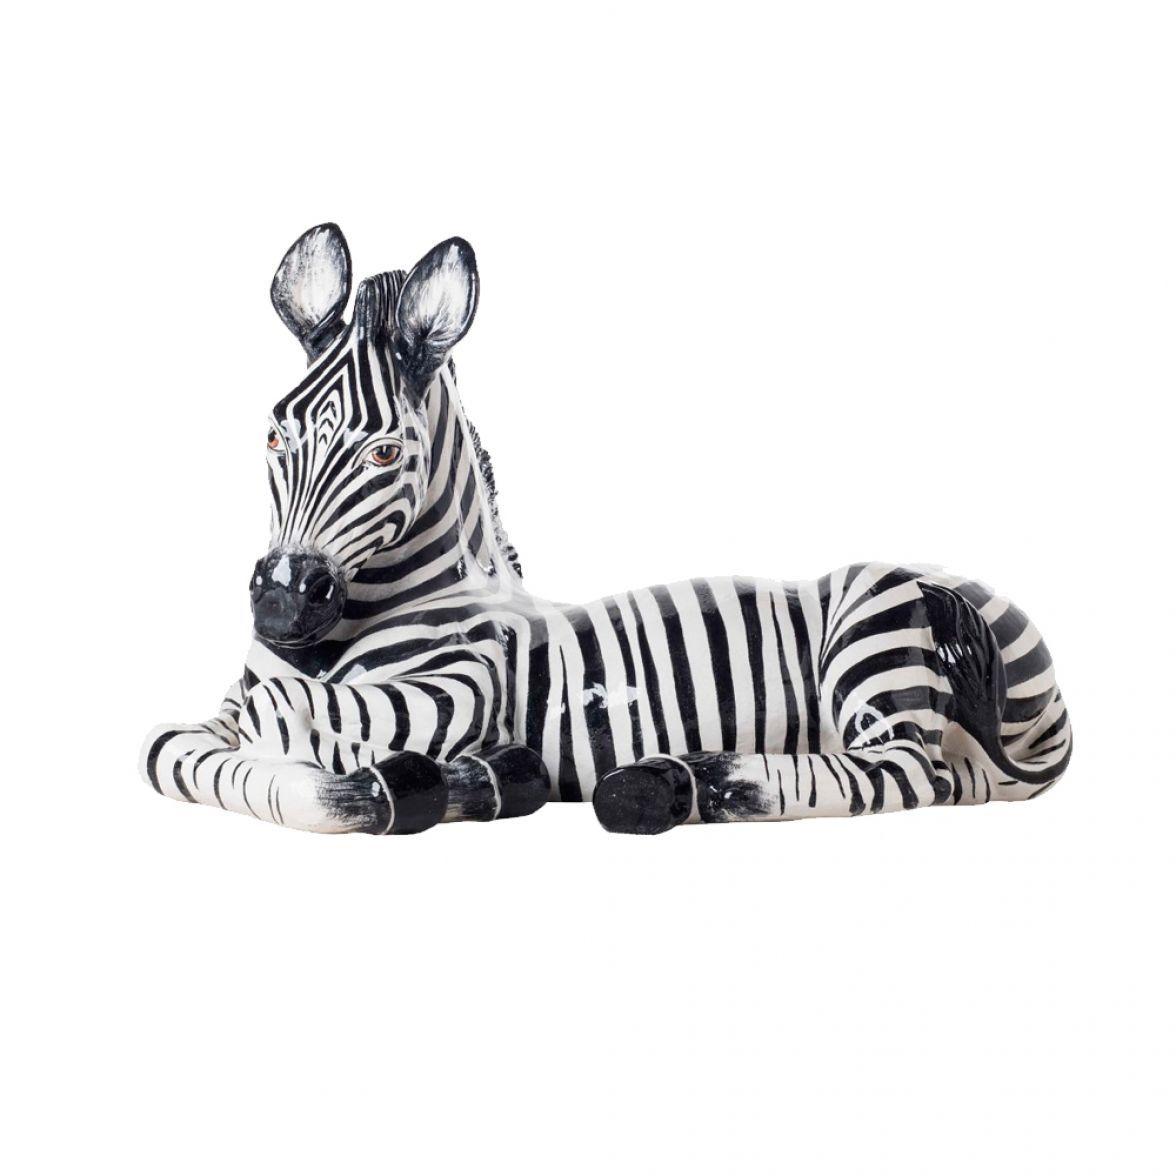 LYING ZEBRA Sculpture